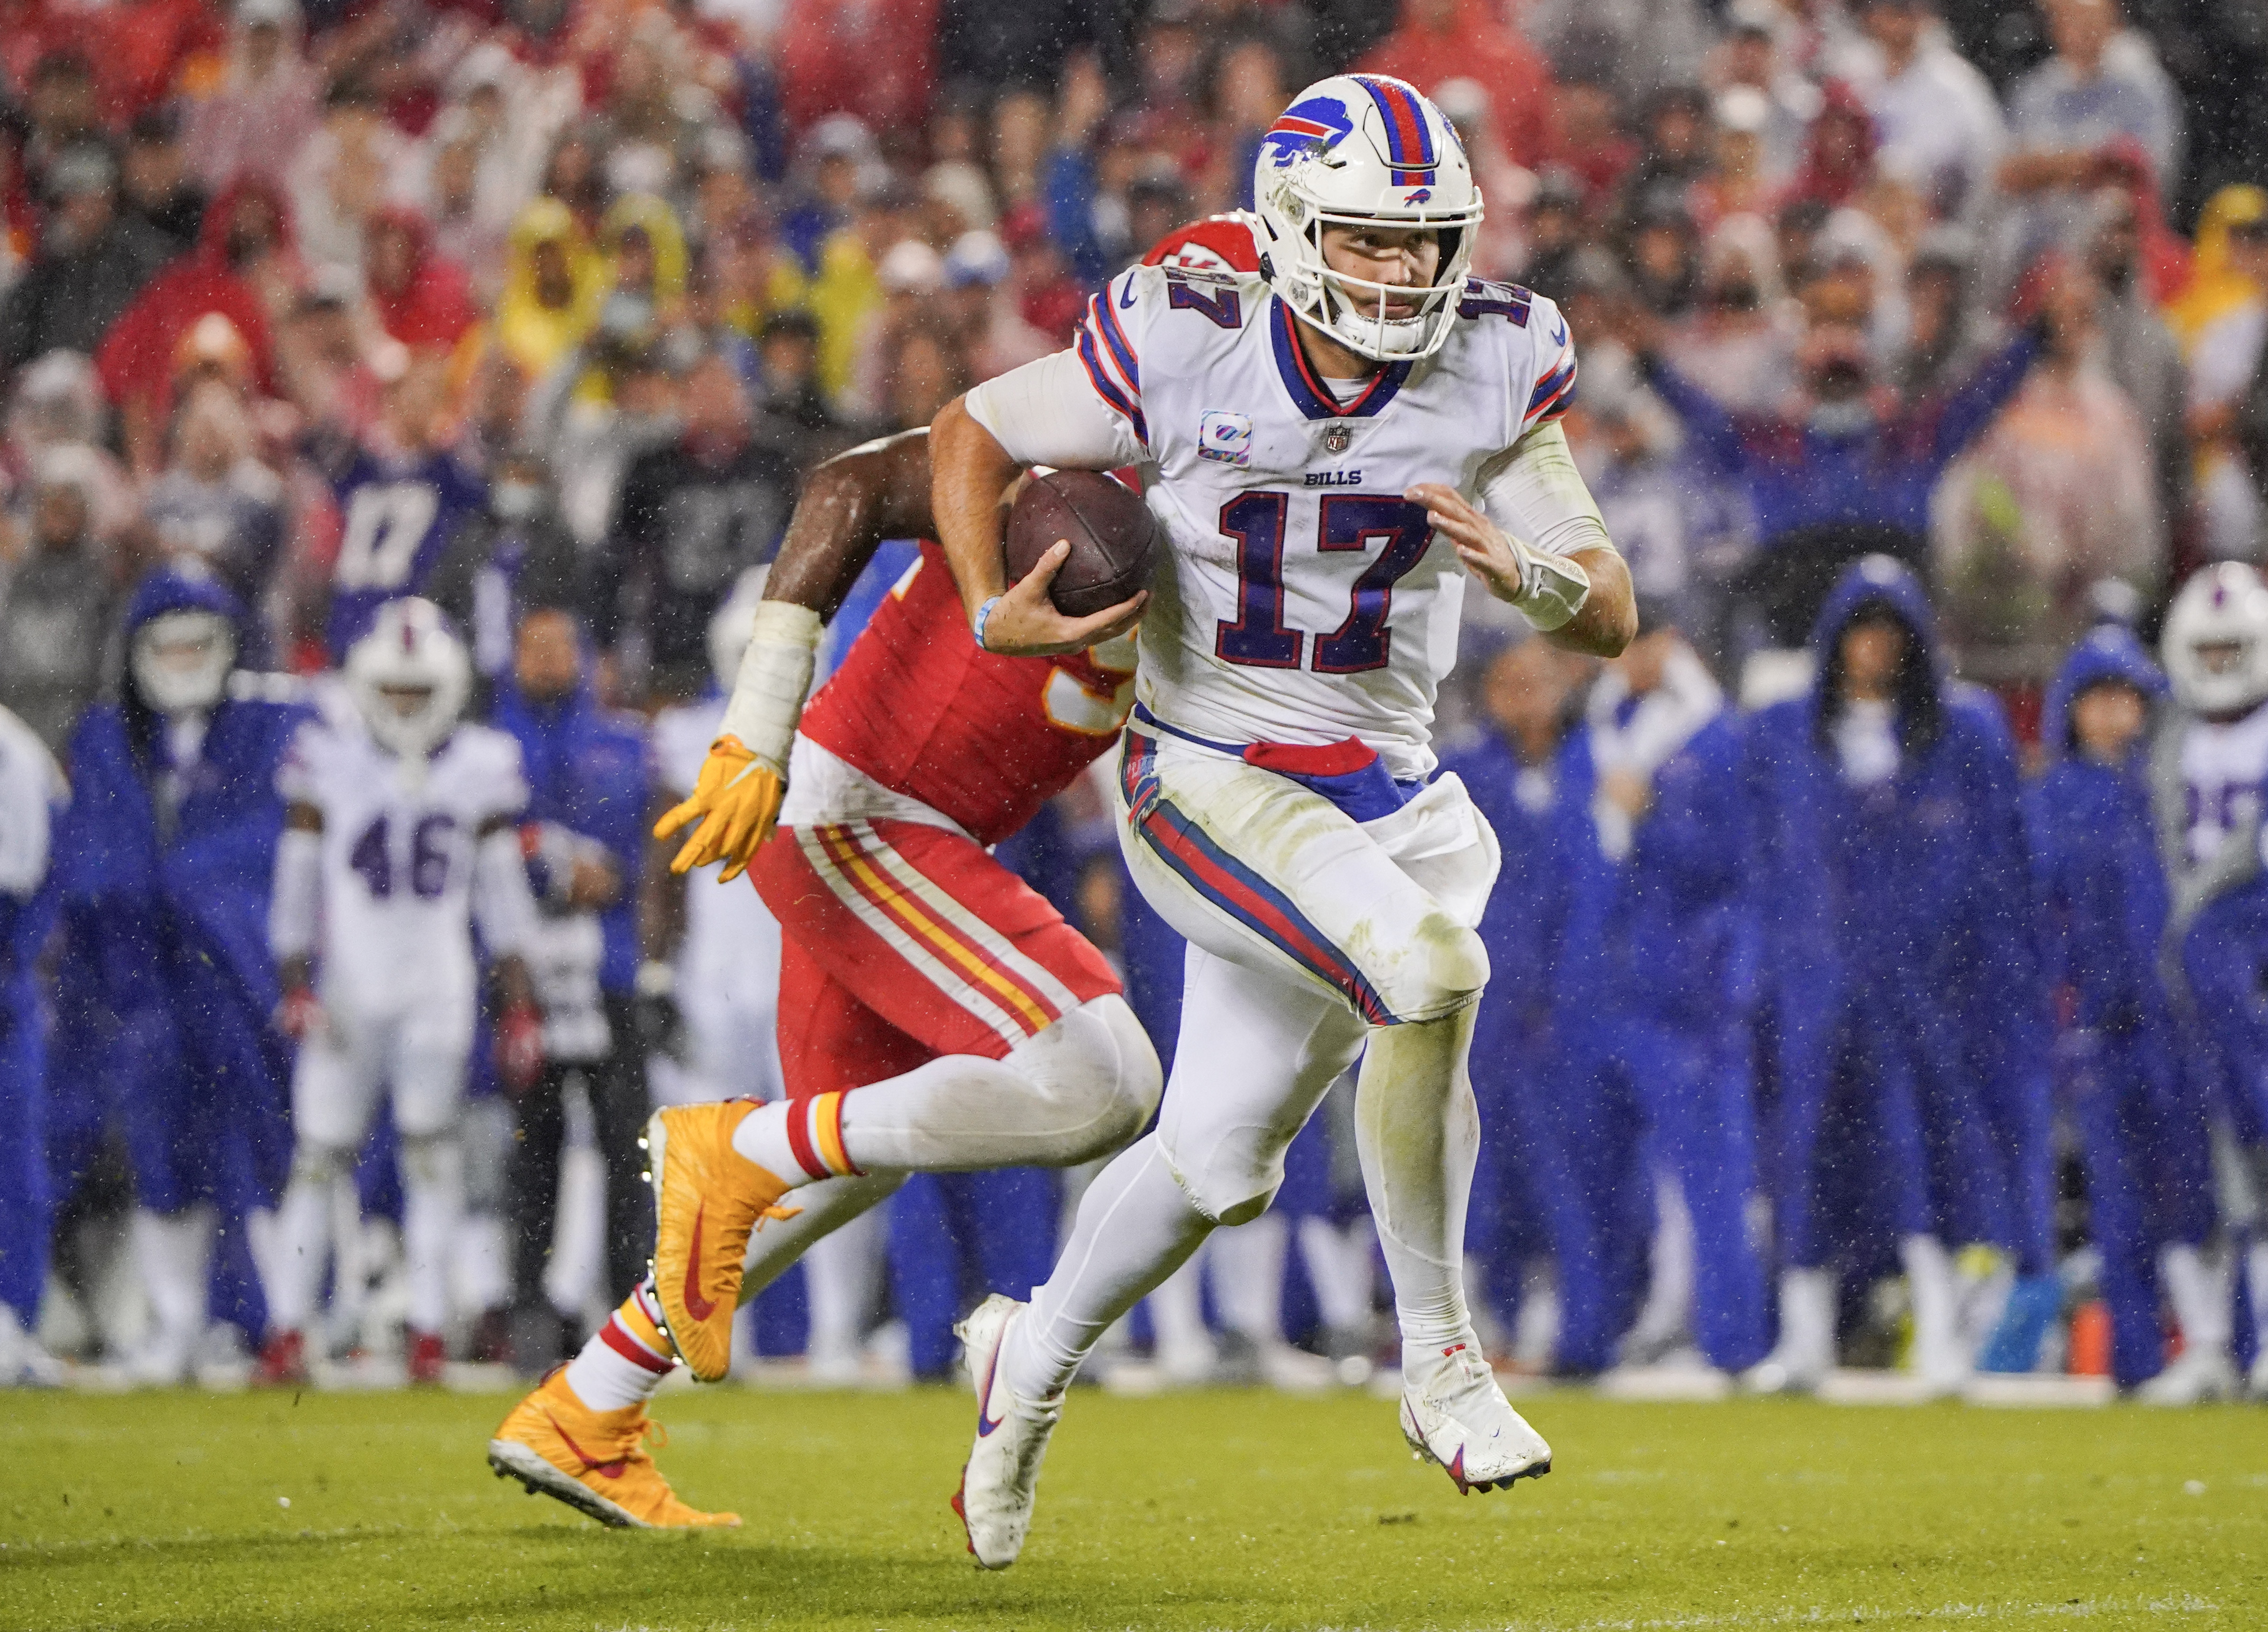 Buffalo Bills quarterback Josh Allen (17) runs the ball against the Kansas City Chiefs during the second half at GEHA Field at Arrowhead Stadium.